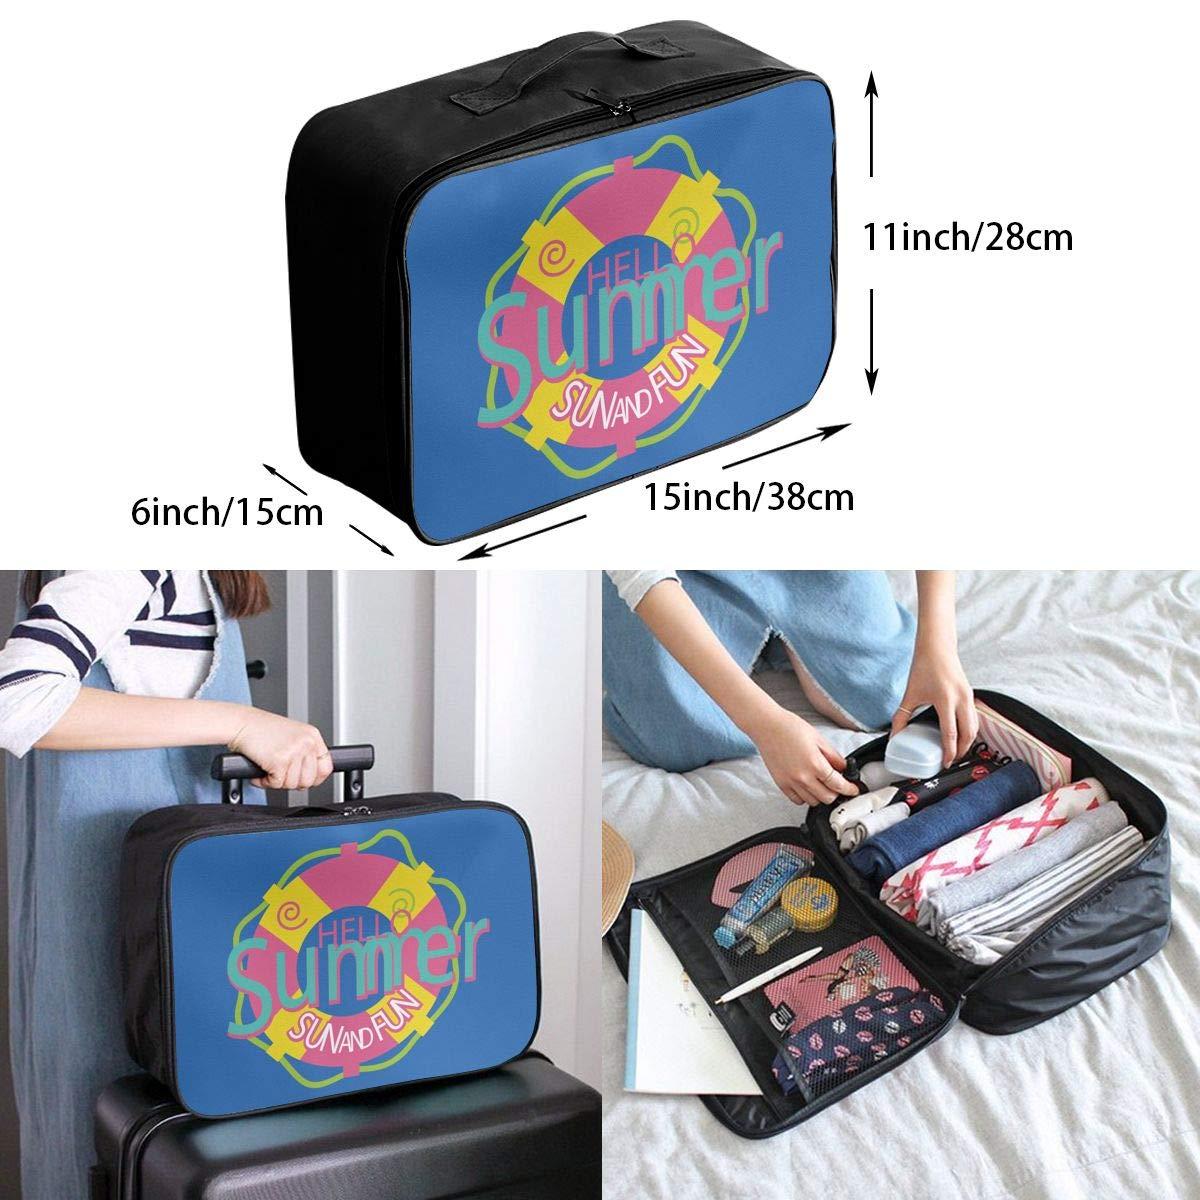 Travel Luggage Duffle Bag Lightweight Portable Handbag Enjoy Summer Large Capacity Waterproof Storage Tote